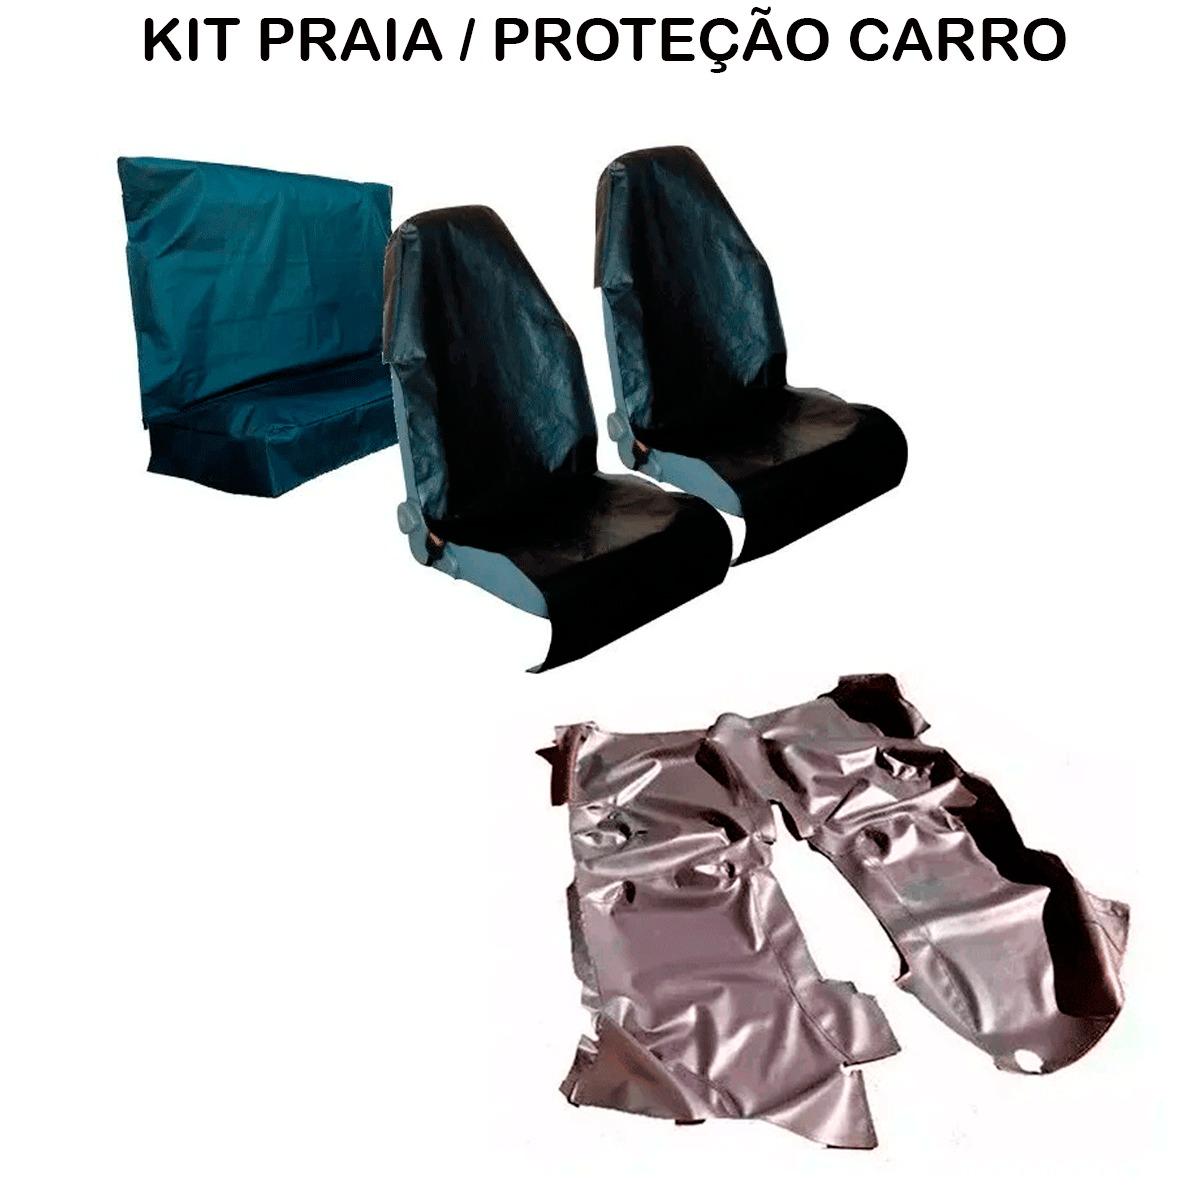 Tapete Em Vinil Nissan Kicks 2016 a 2020 + Capa Banco Protecao Banco Areia Suor Academia